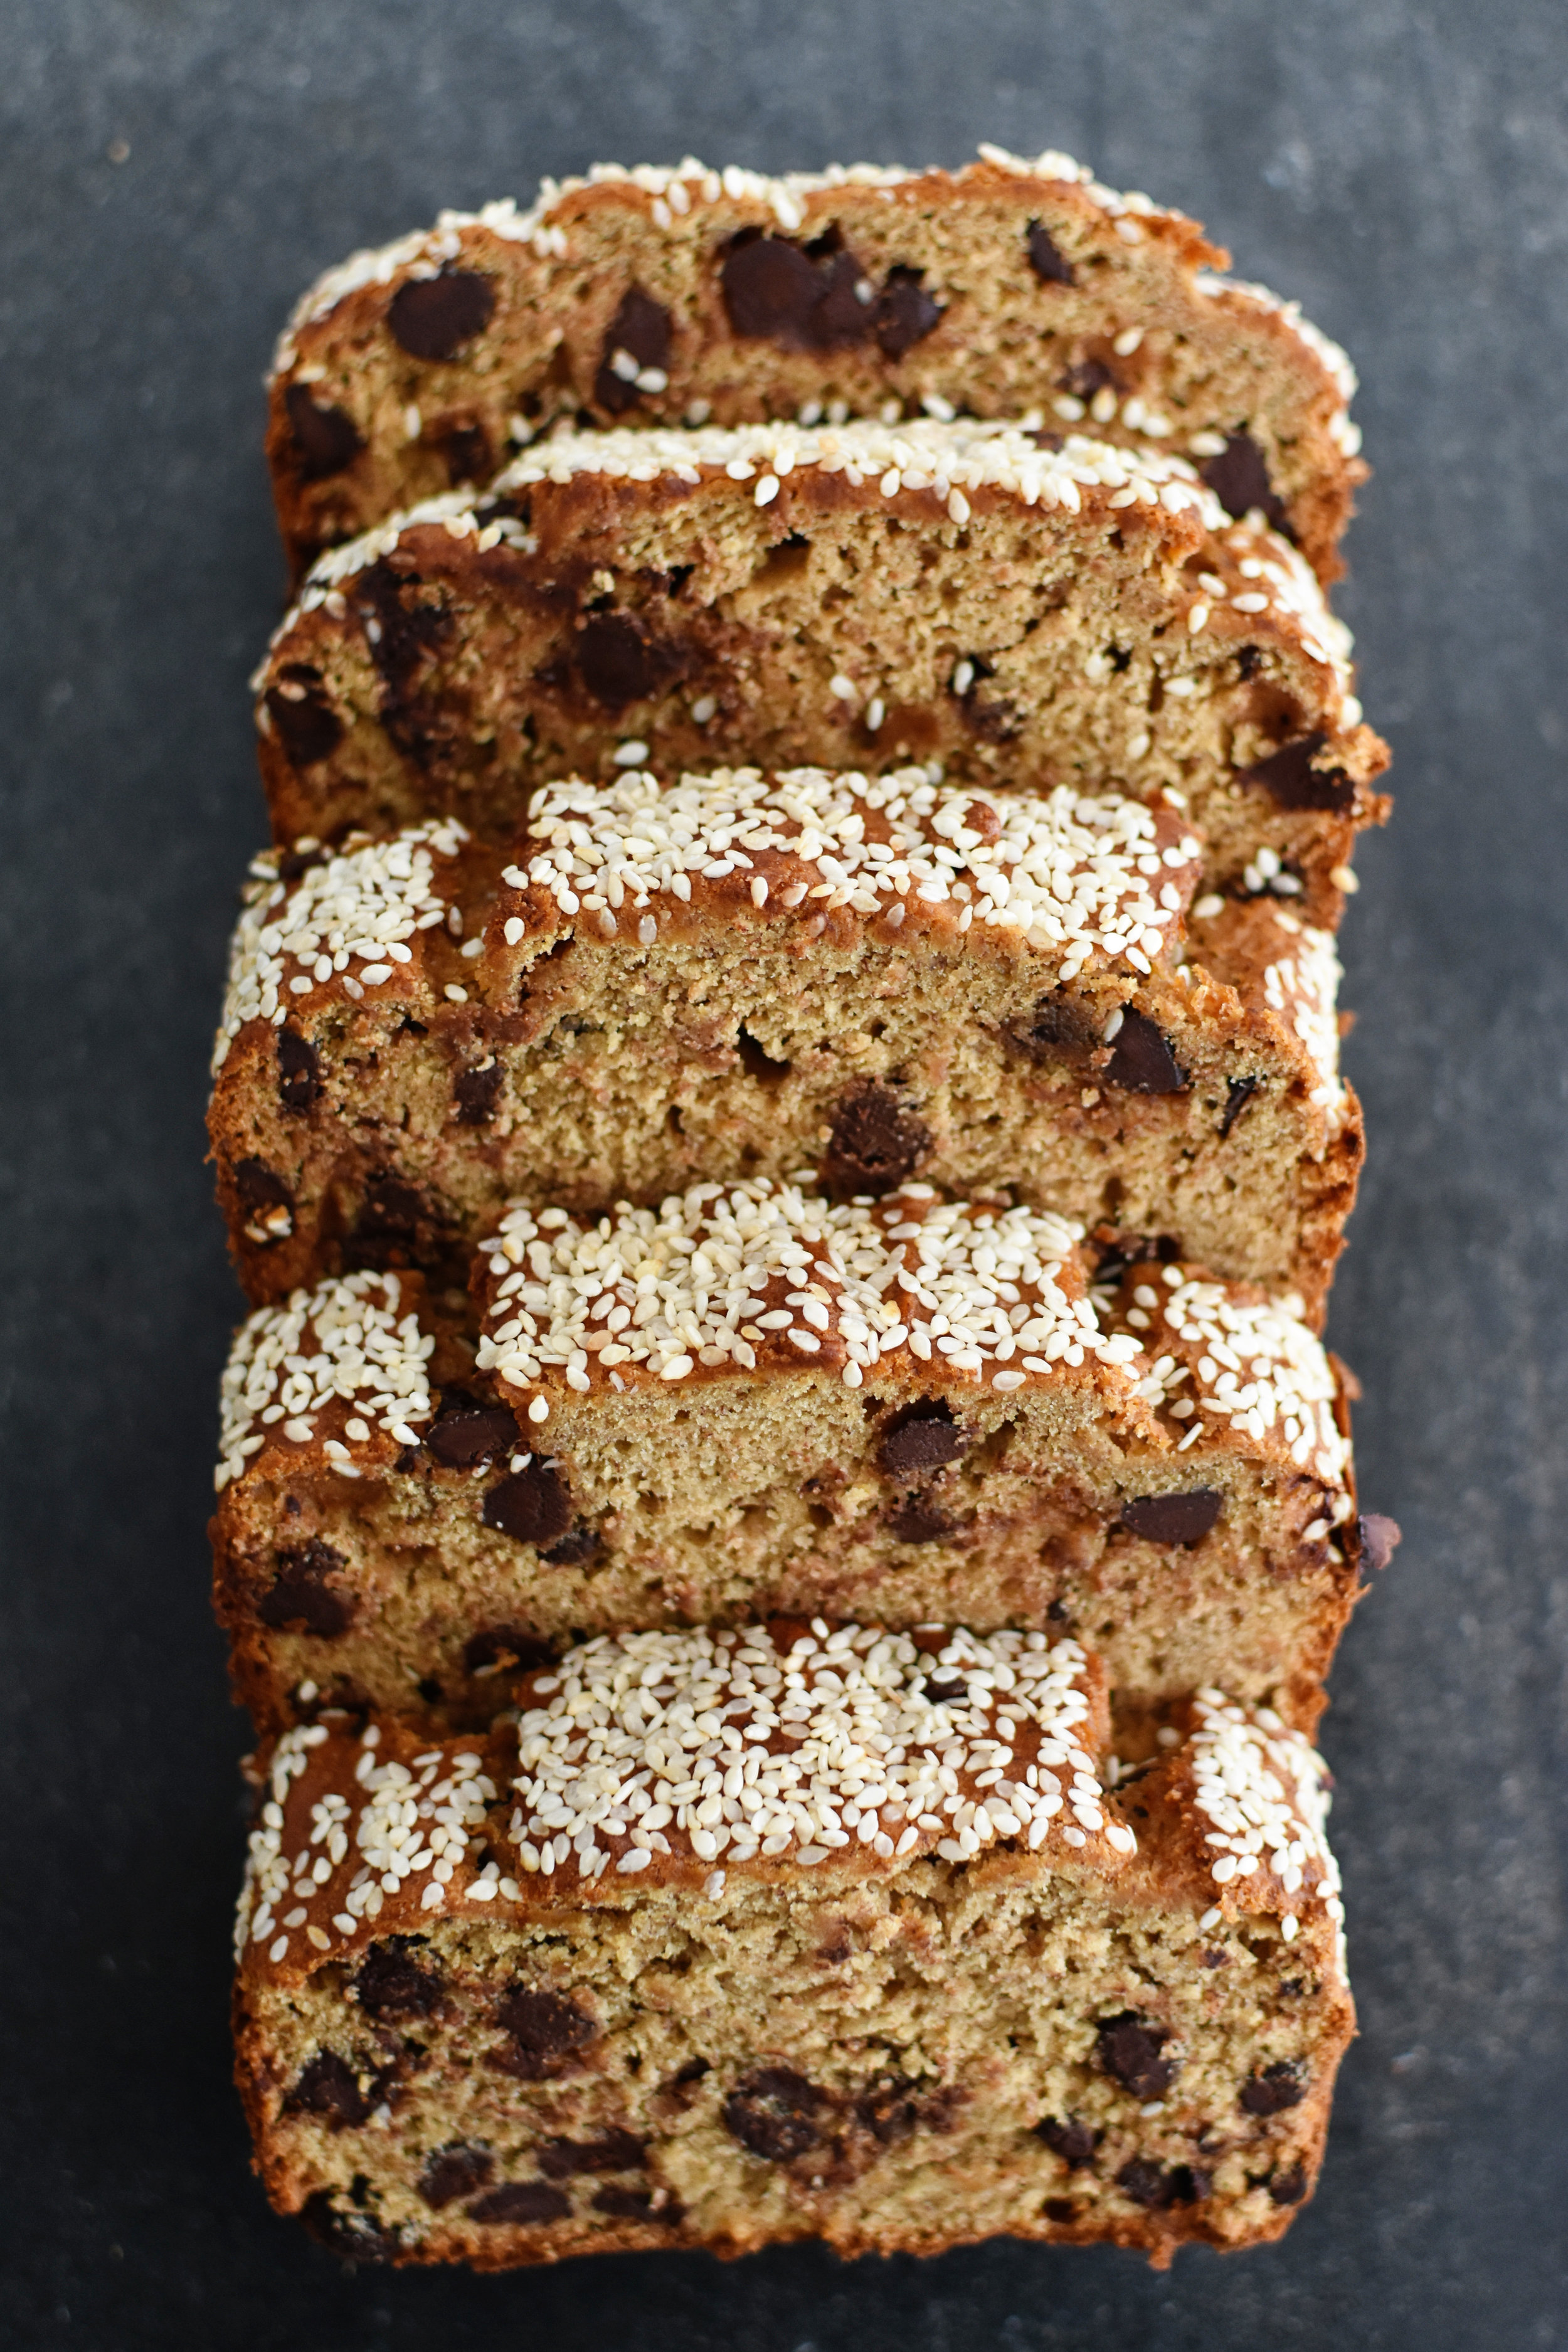 Choc Chip Tahini Banana Bread 1.jpg